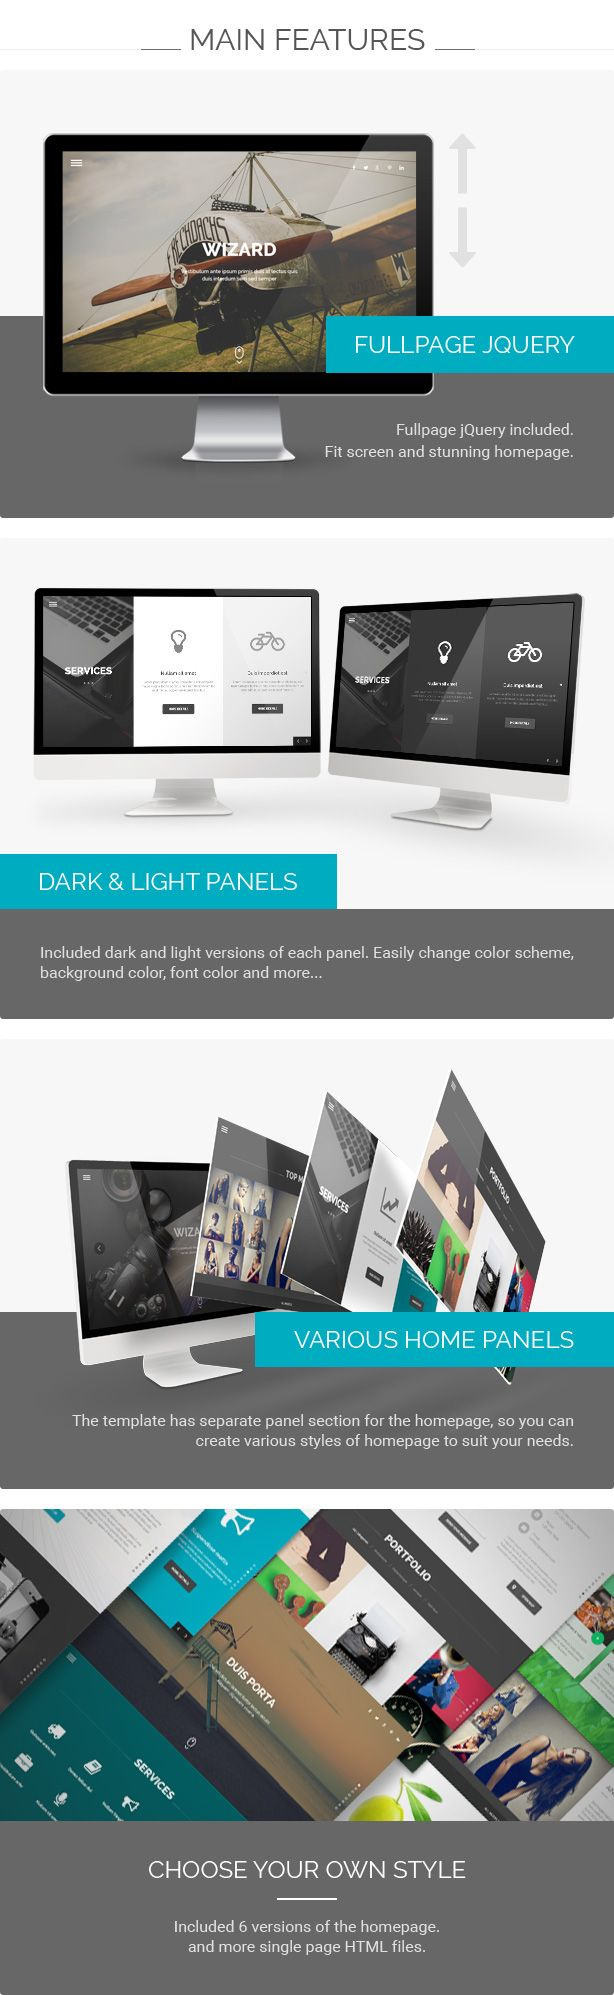 Wizard - Fullpage Portfolio HTML Template | Template